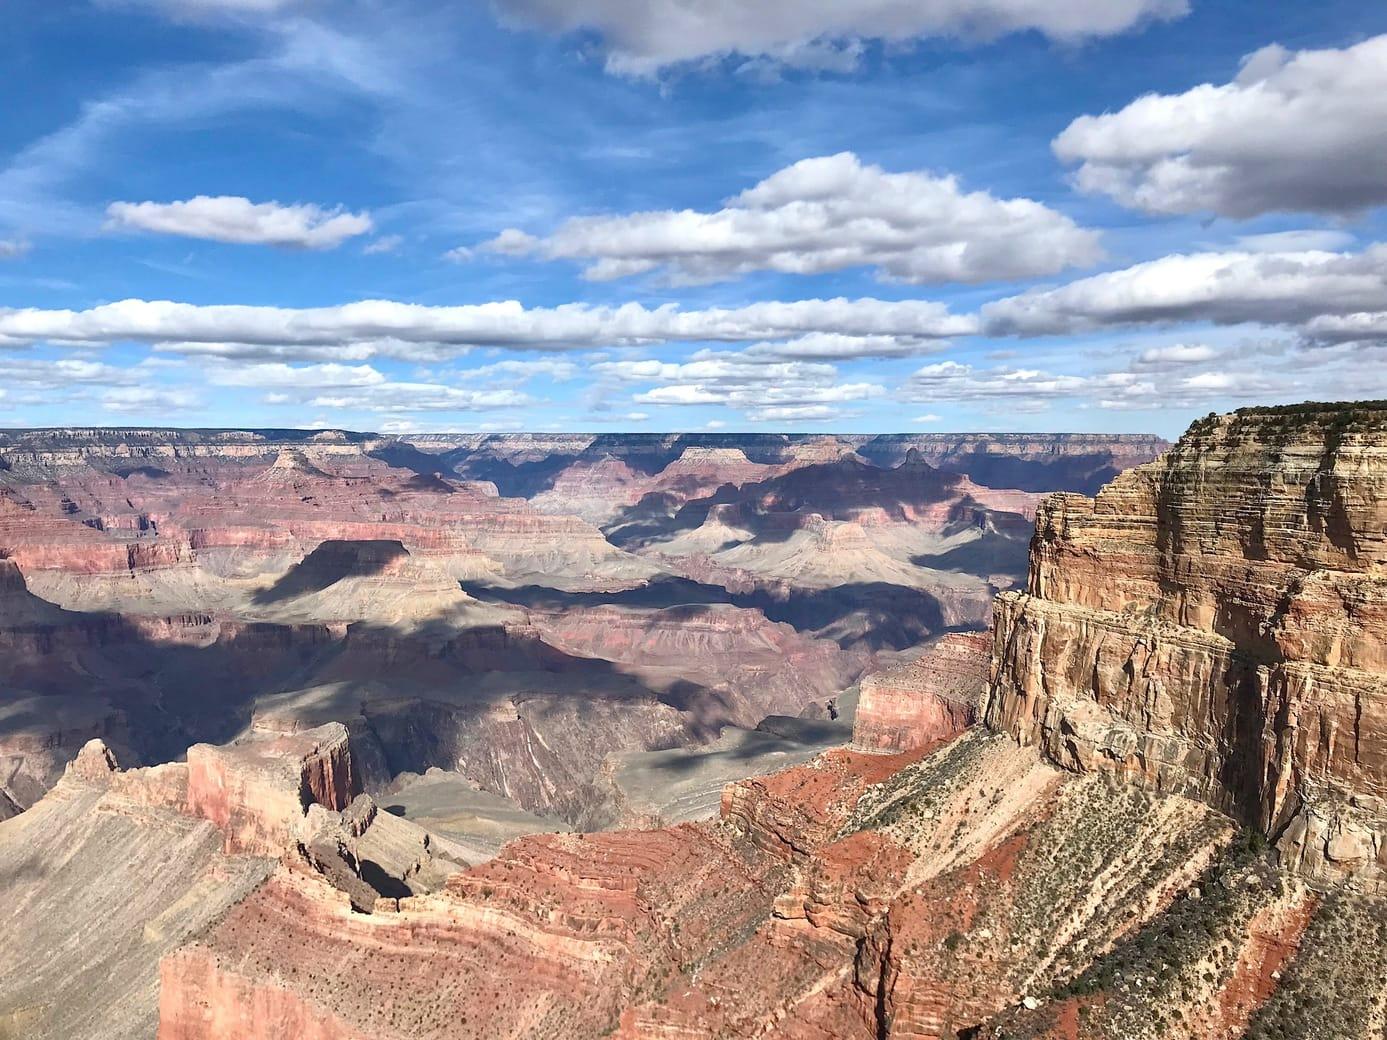 Image of Grand Canyon